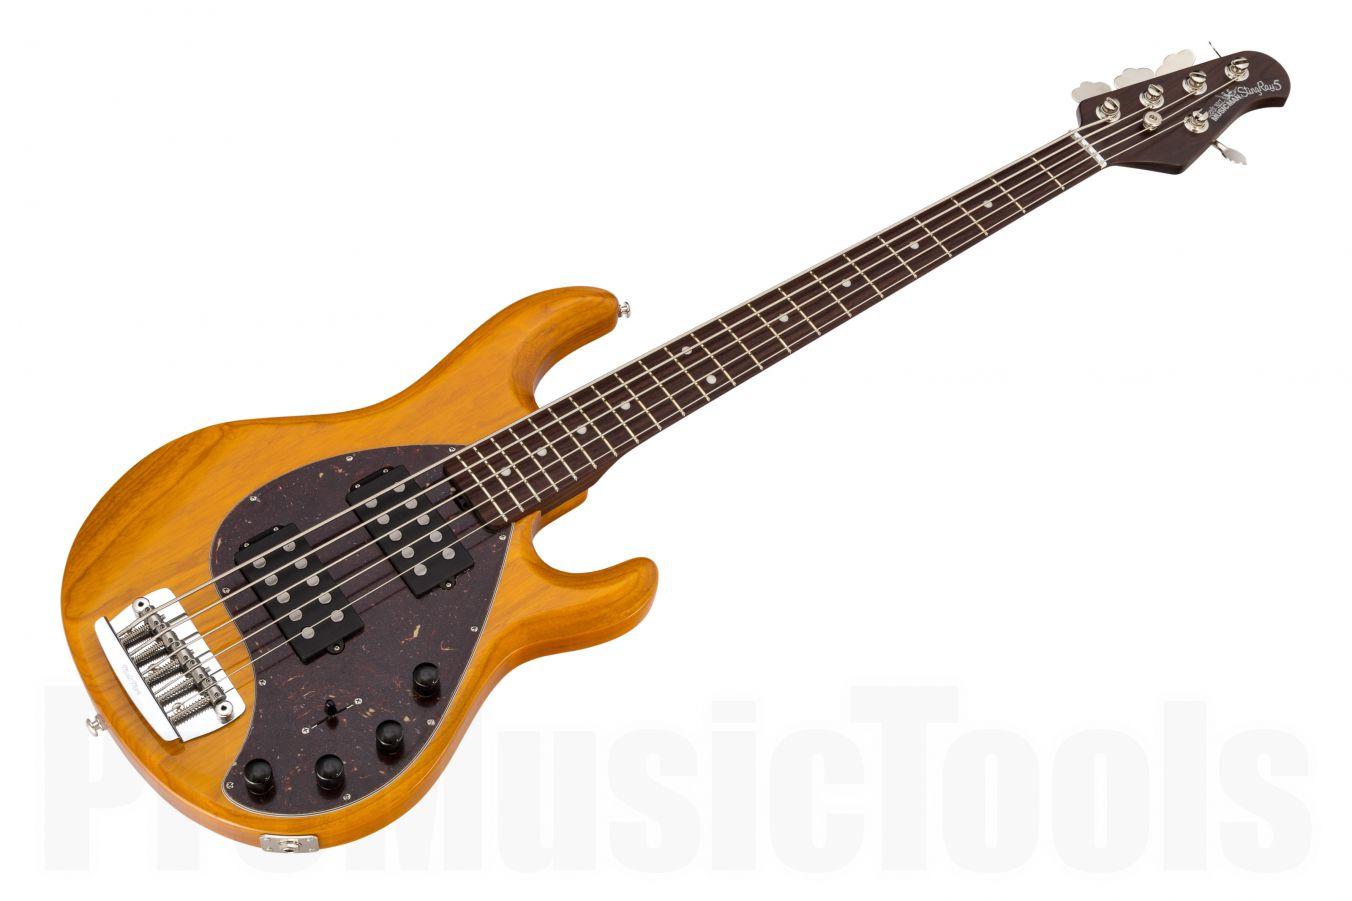 Music Man USA Stingray 5 HH TG - Translucent Gold - Rosewood Neck Limited Edition